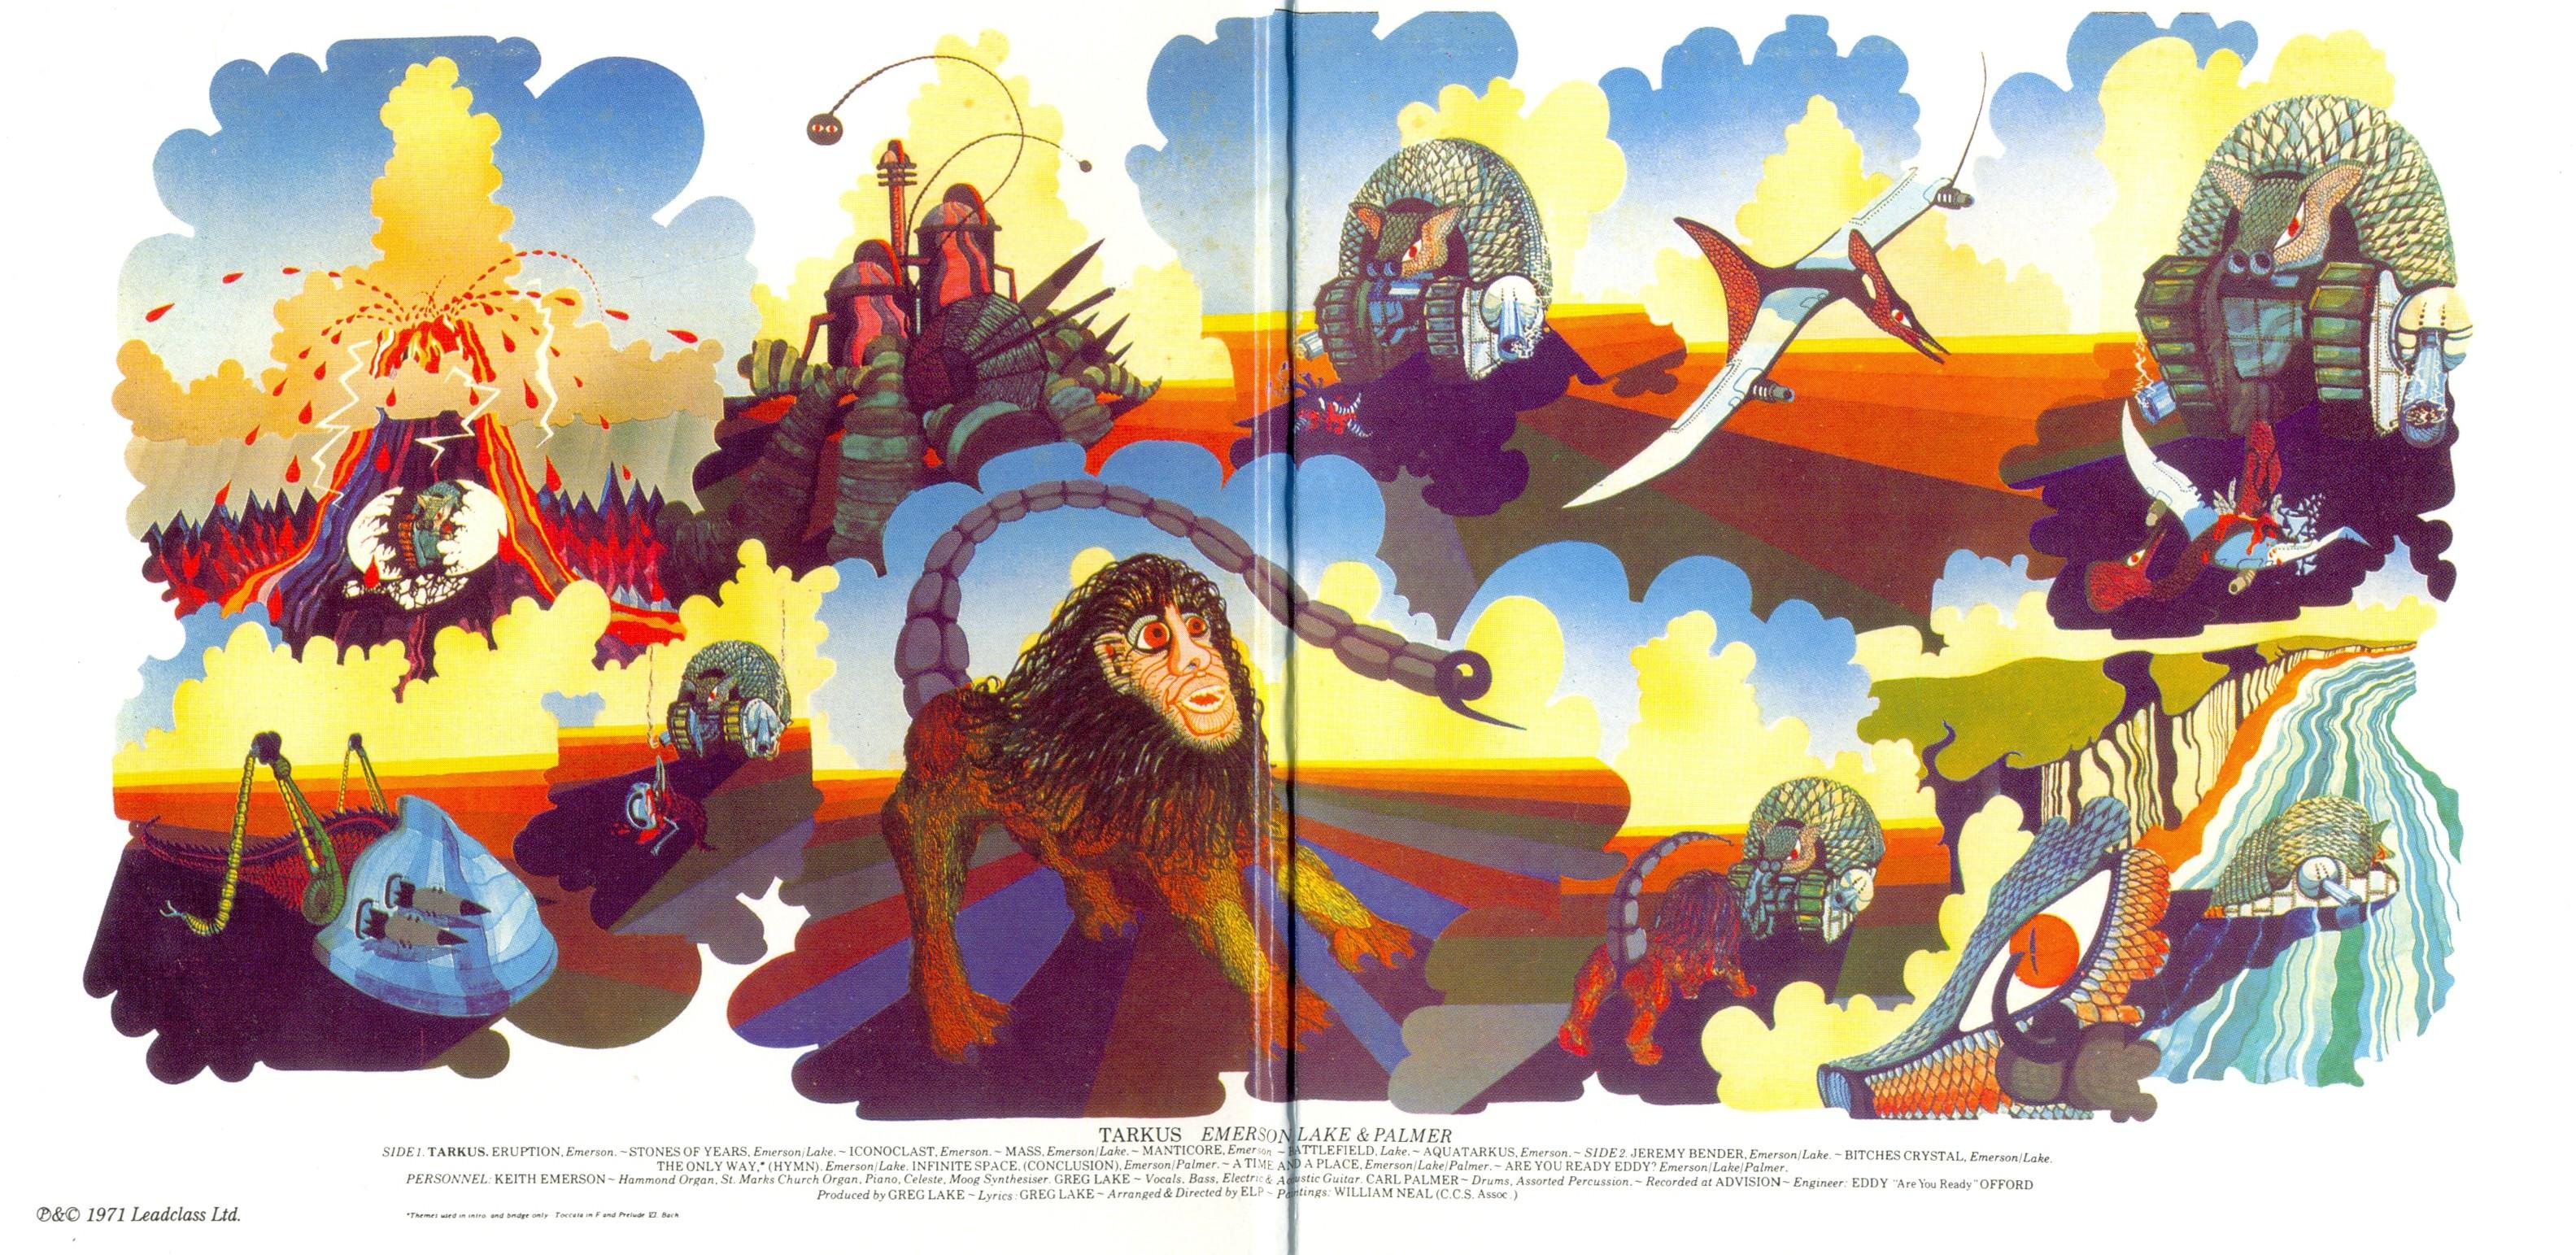 Riletture Emerson Lake Amp Palmer Tarkus Island Records